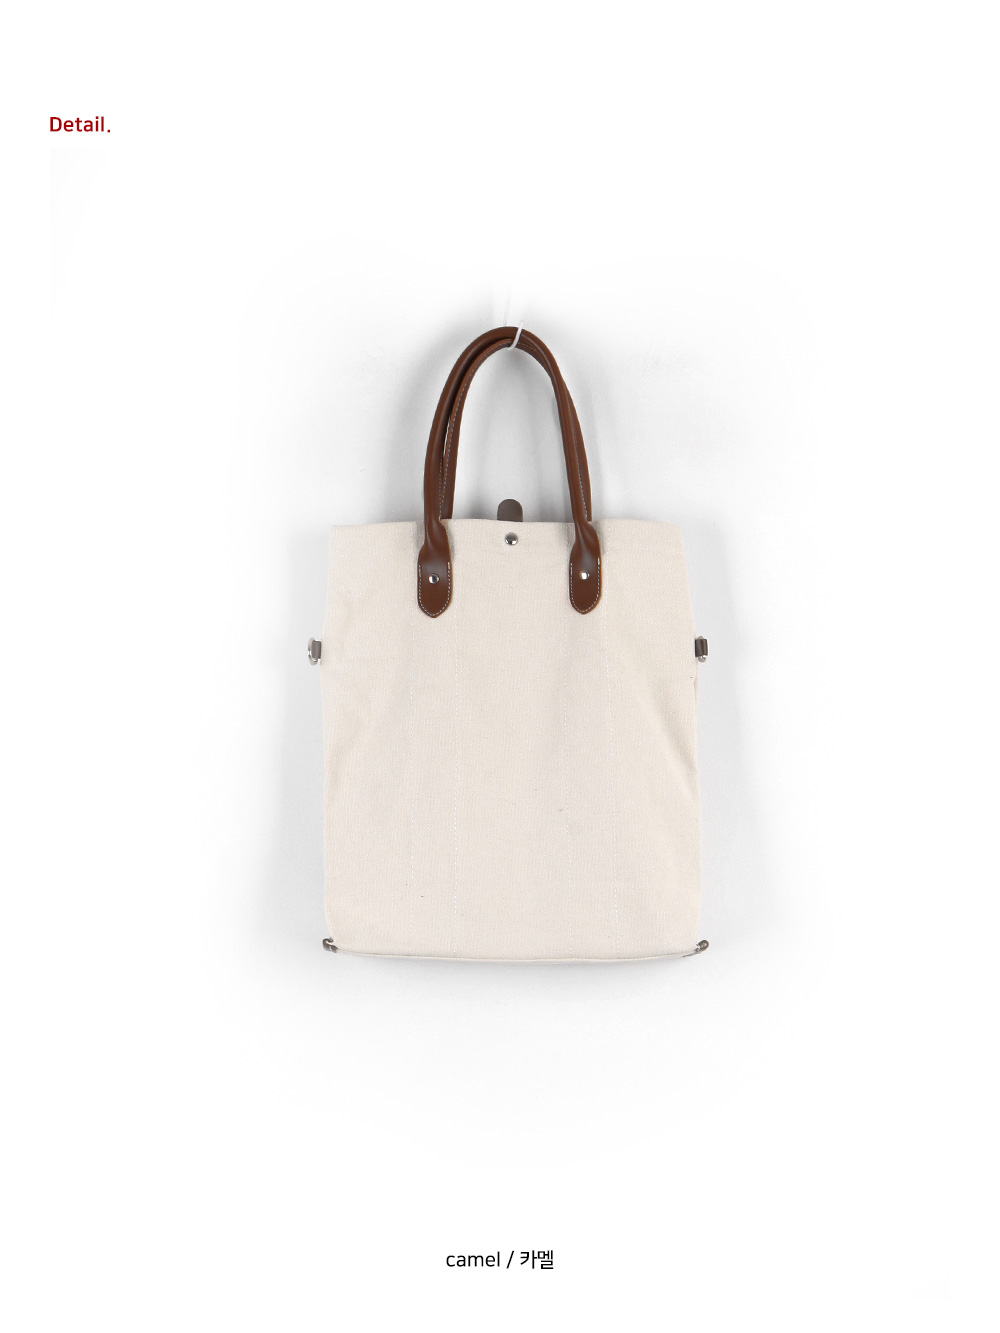 Most square crossbody bag